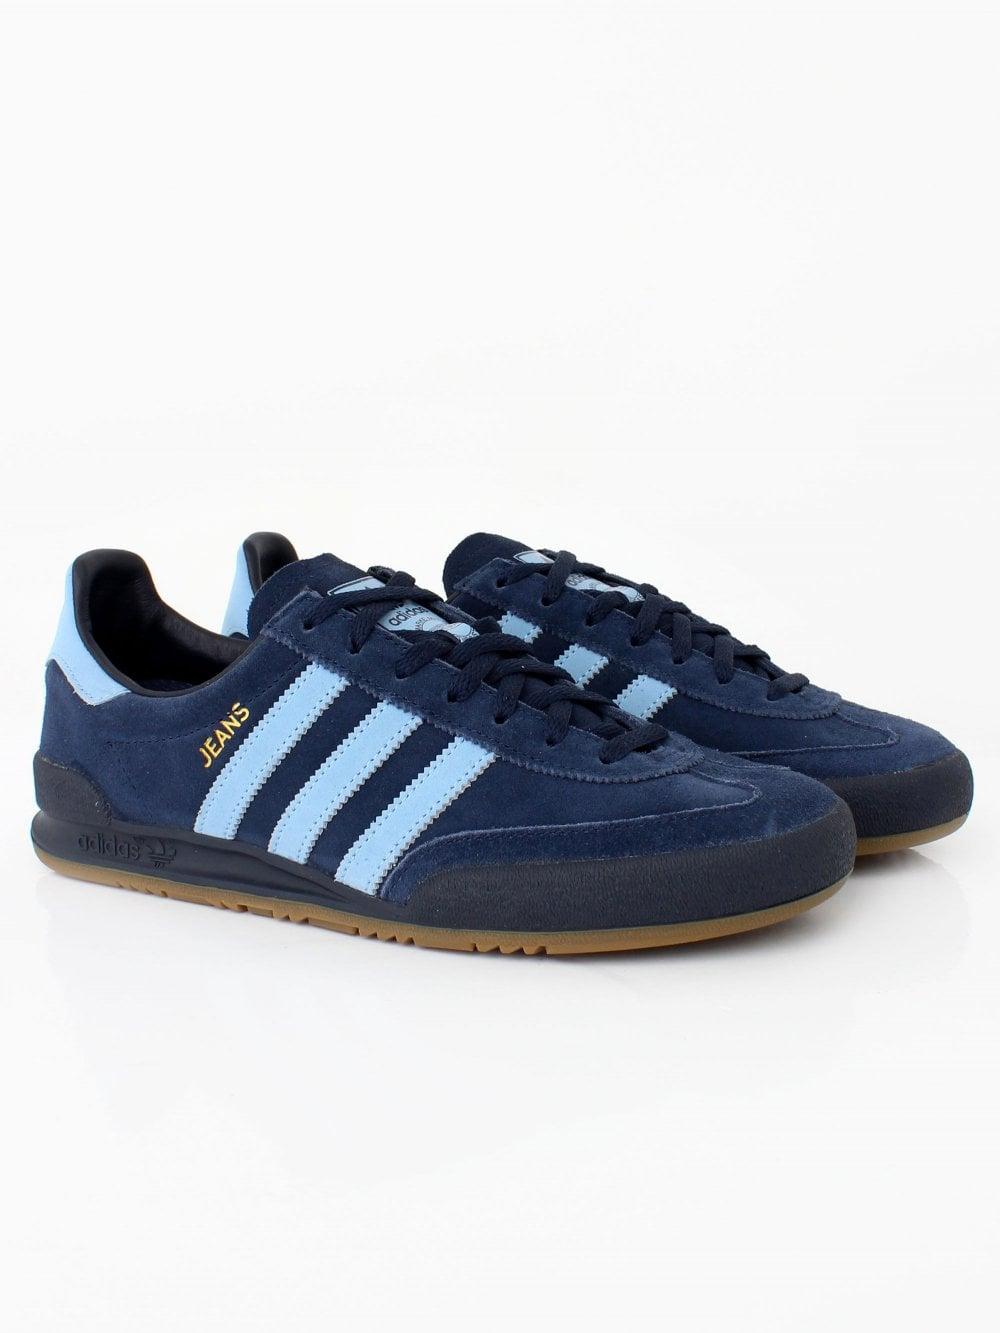 Adidas Jeans in Blue/Aqua